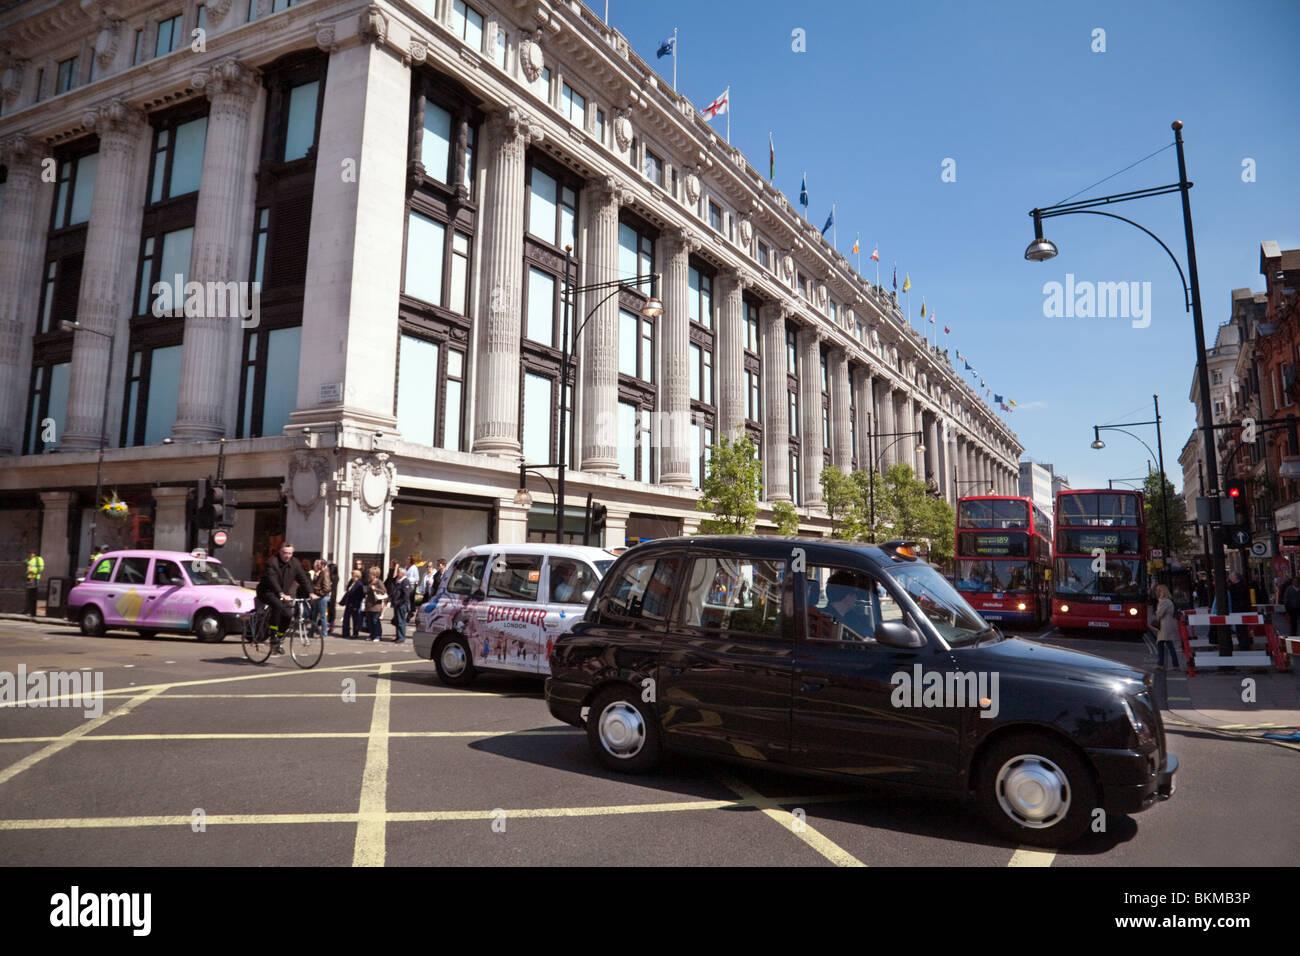 London Taxis outside the Selfridges store, Oxford Street, London UK - Stock Image